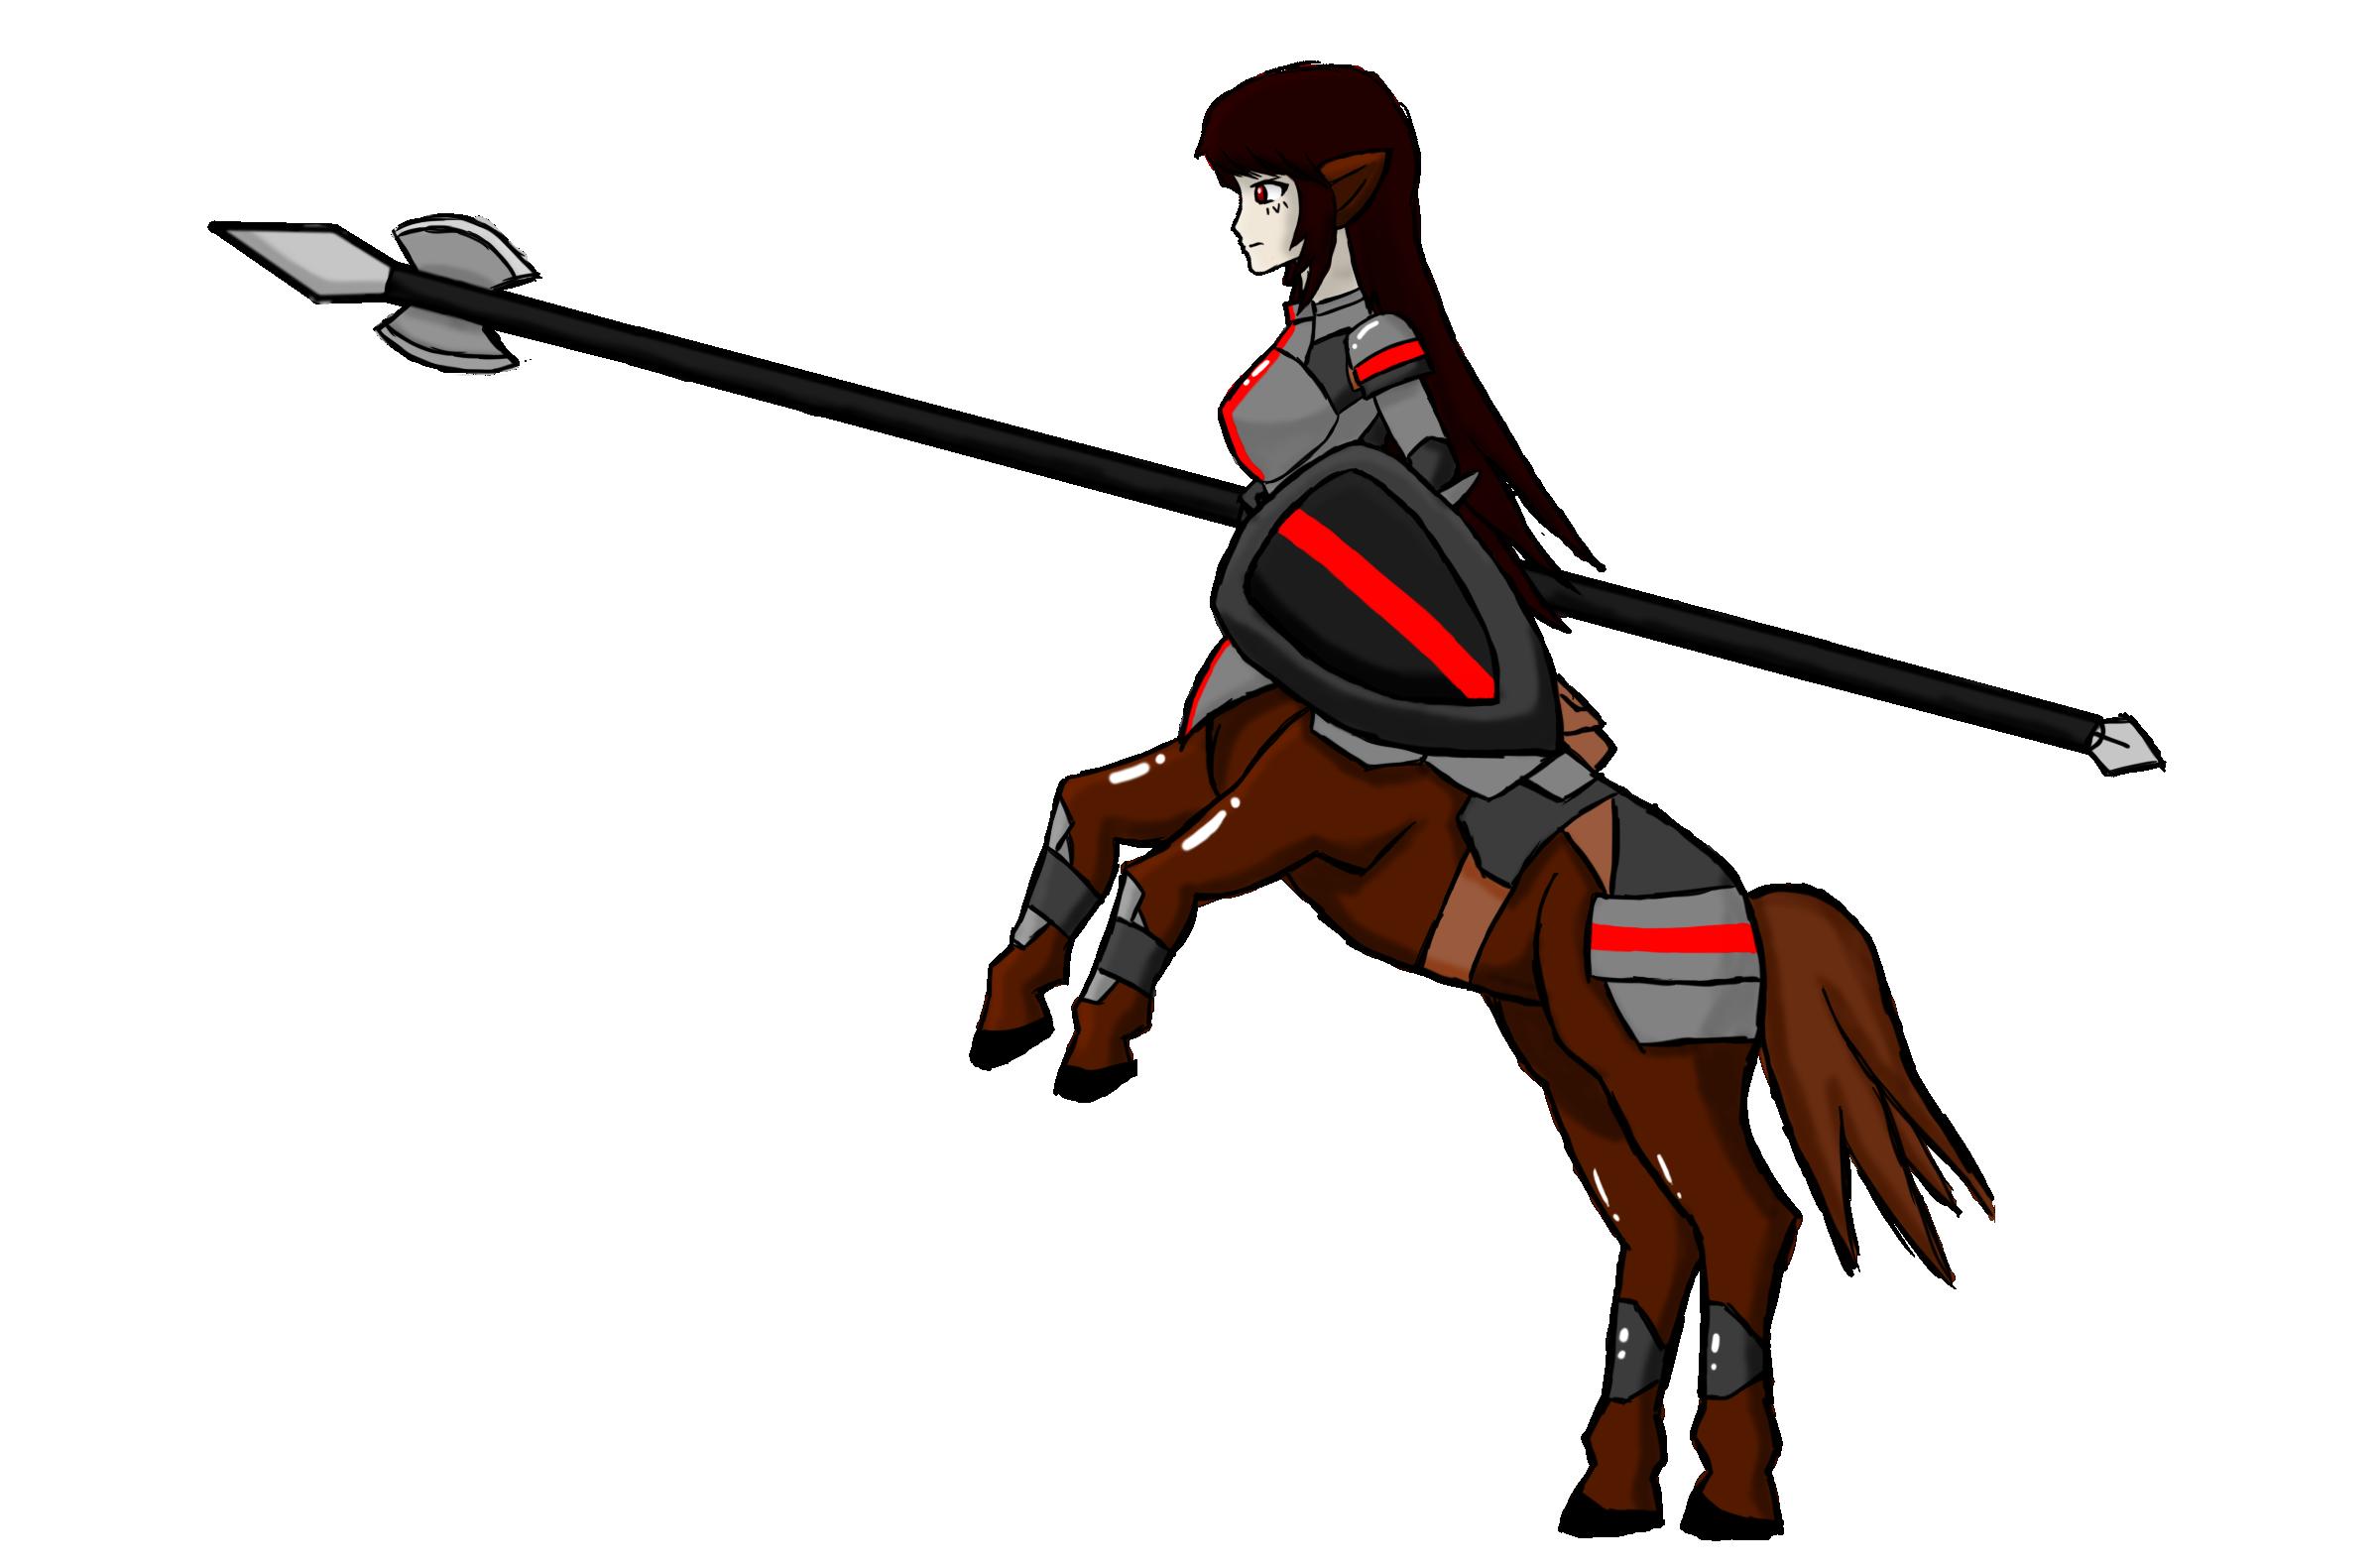 Knight clipart lance. Sagitas centaur by spartan